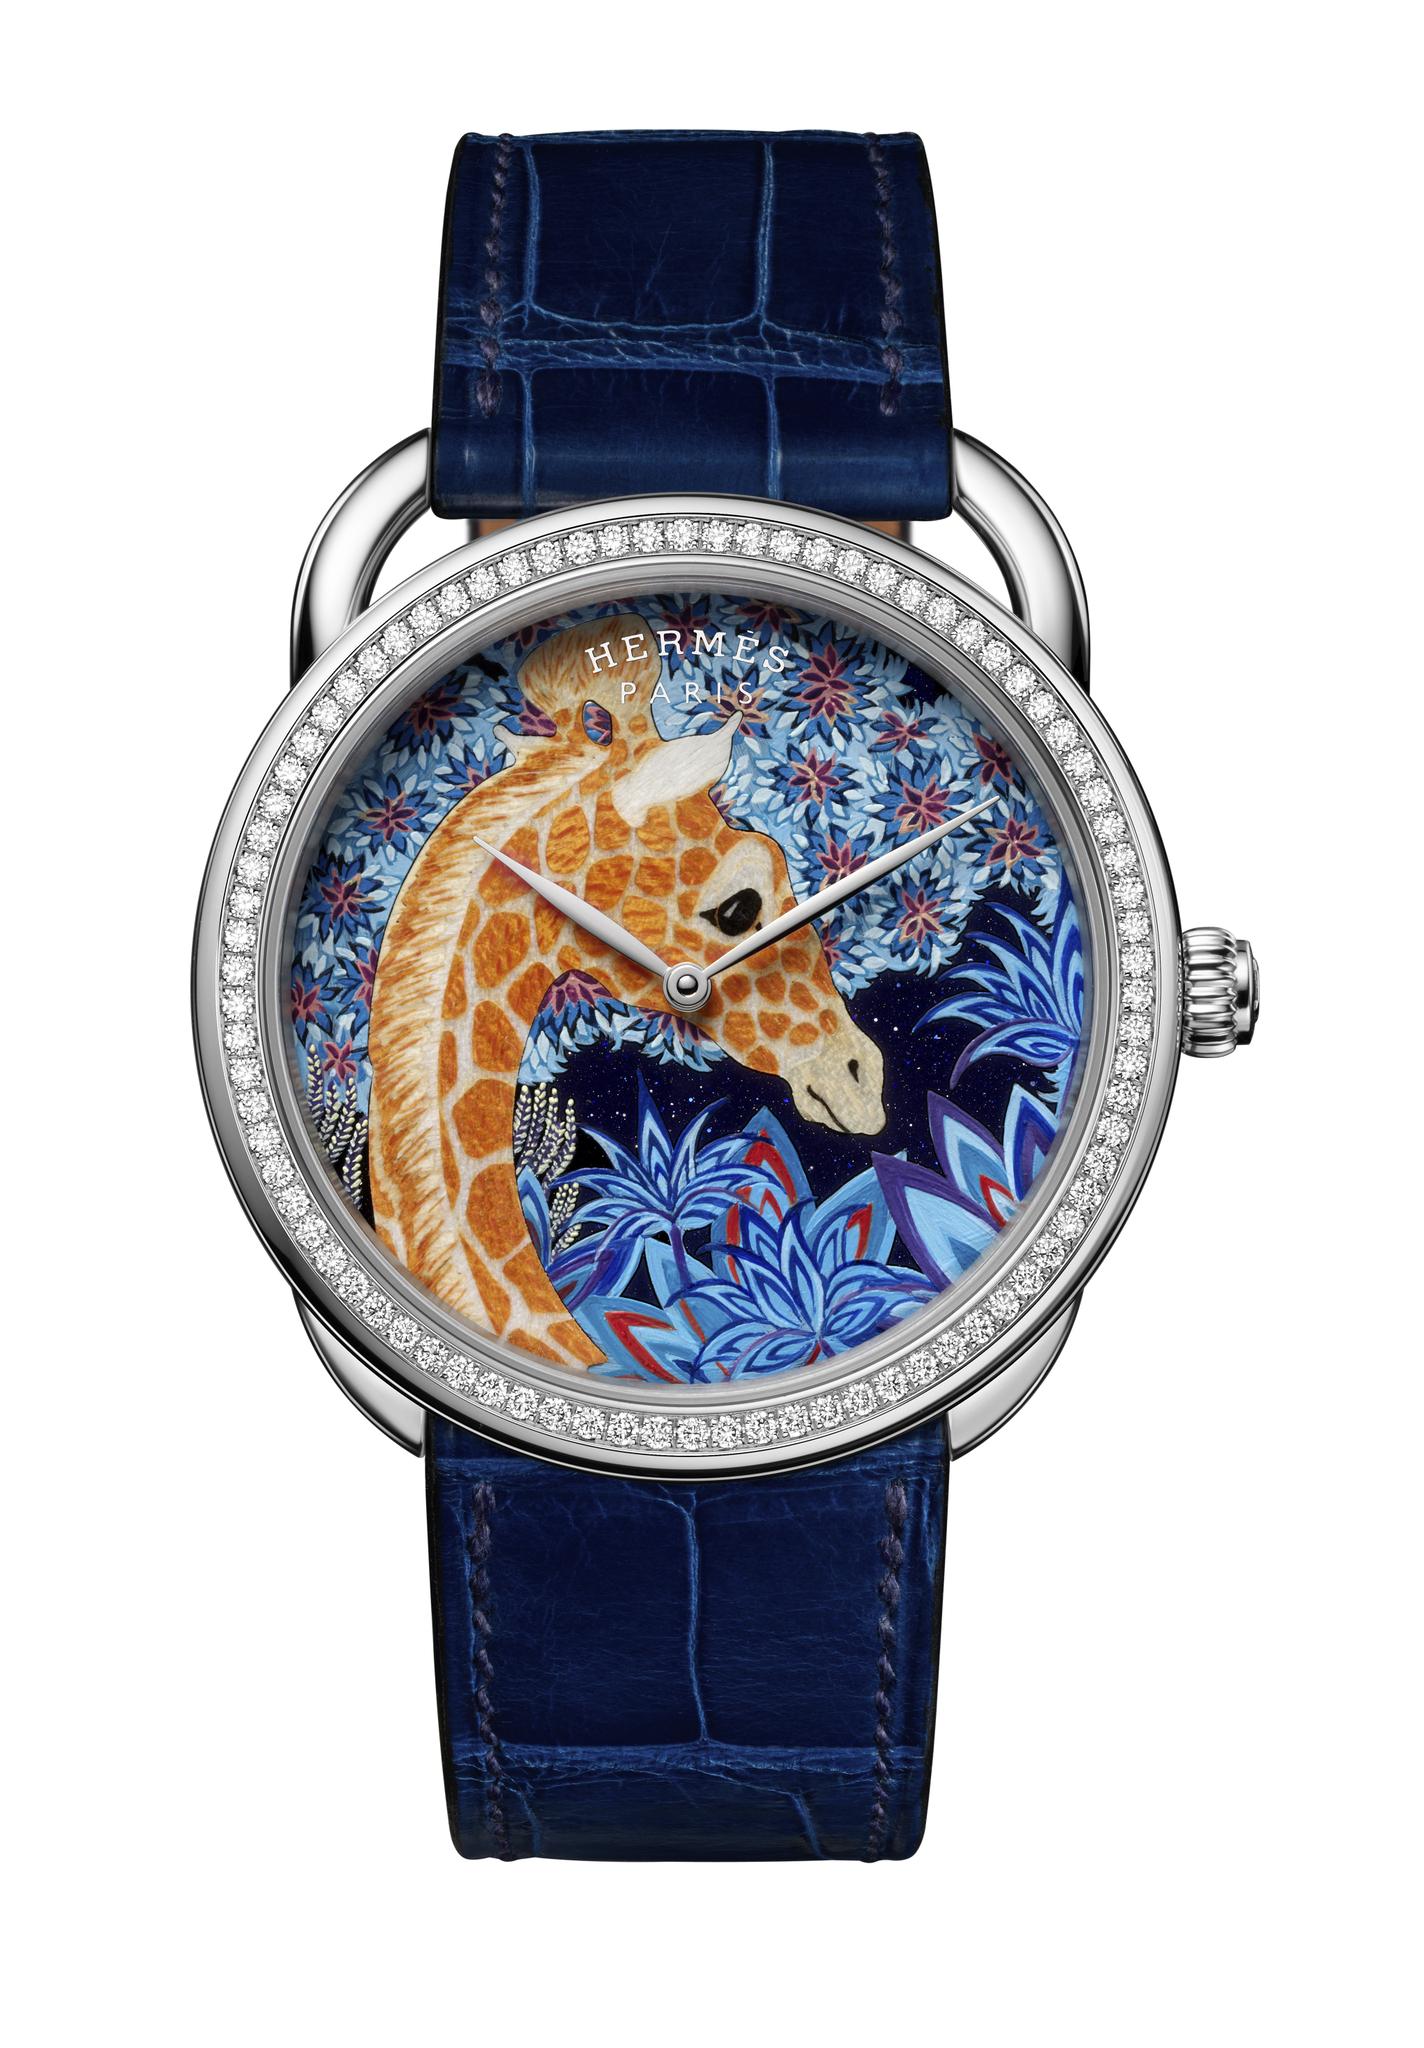 Hermes Arceau The Three Graces watch